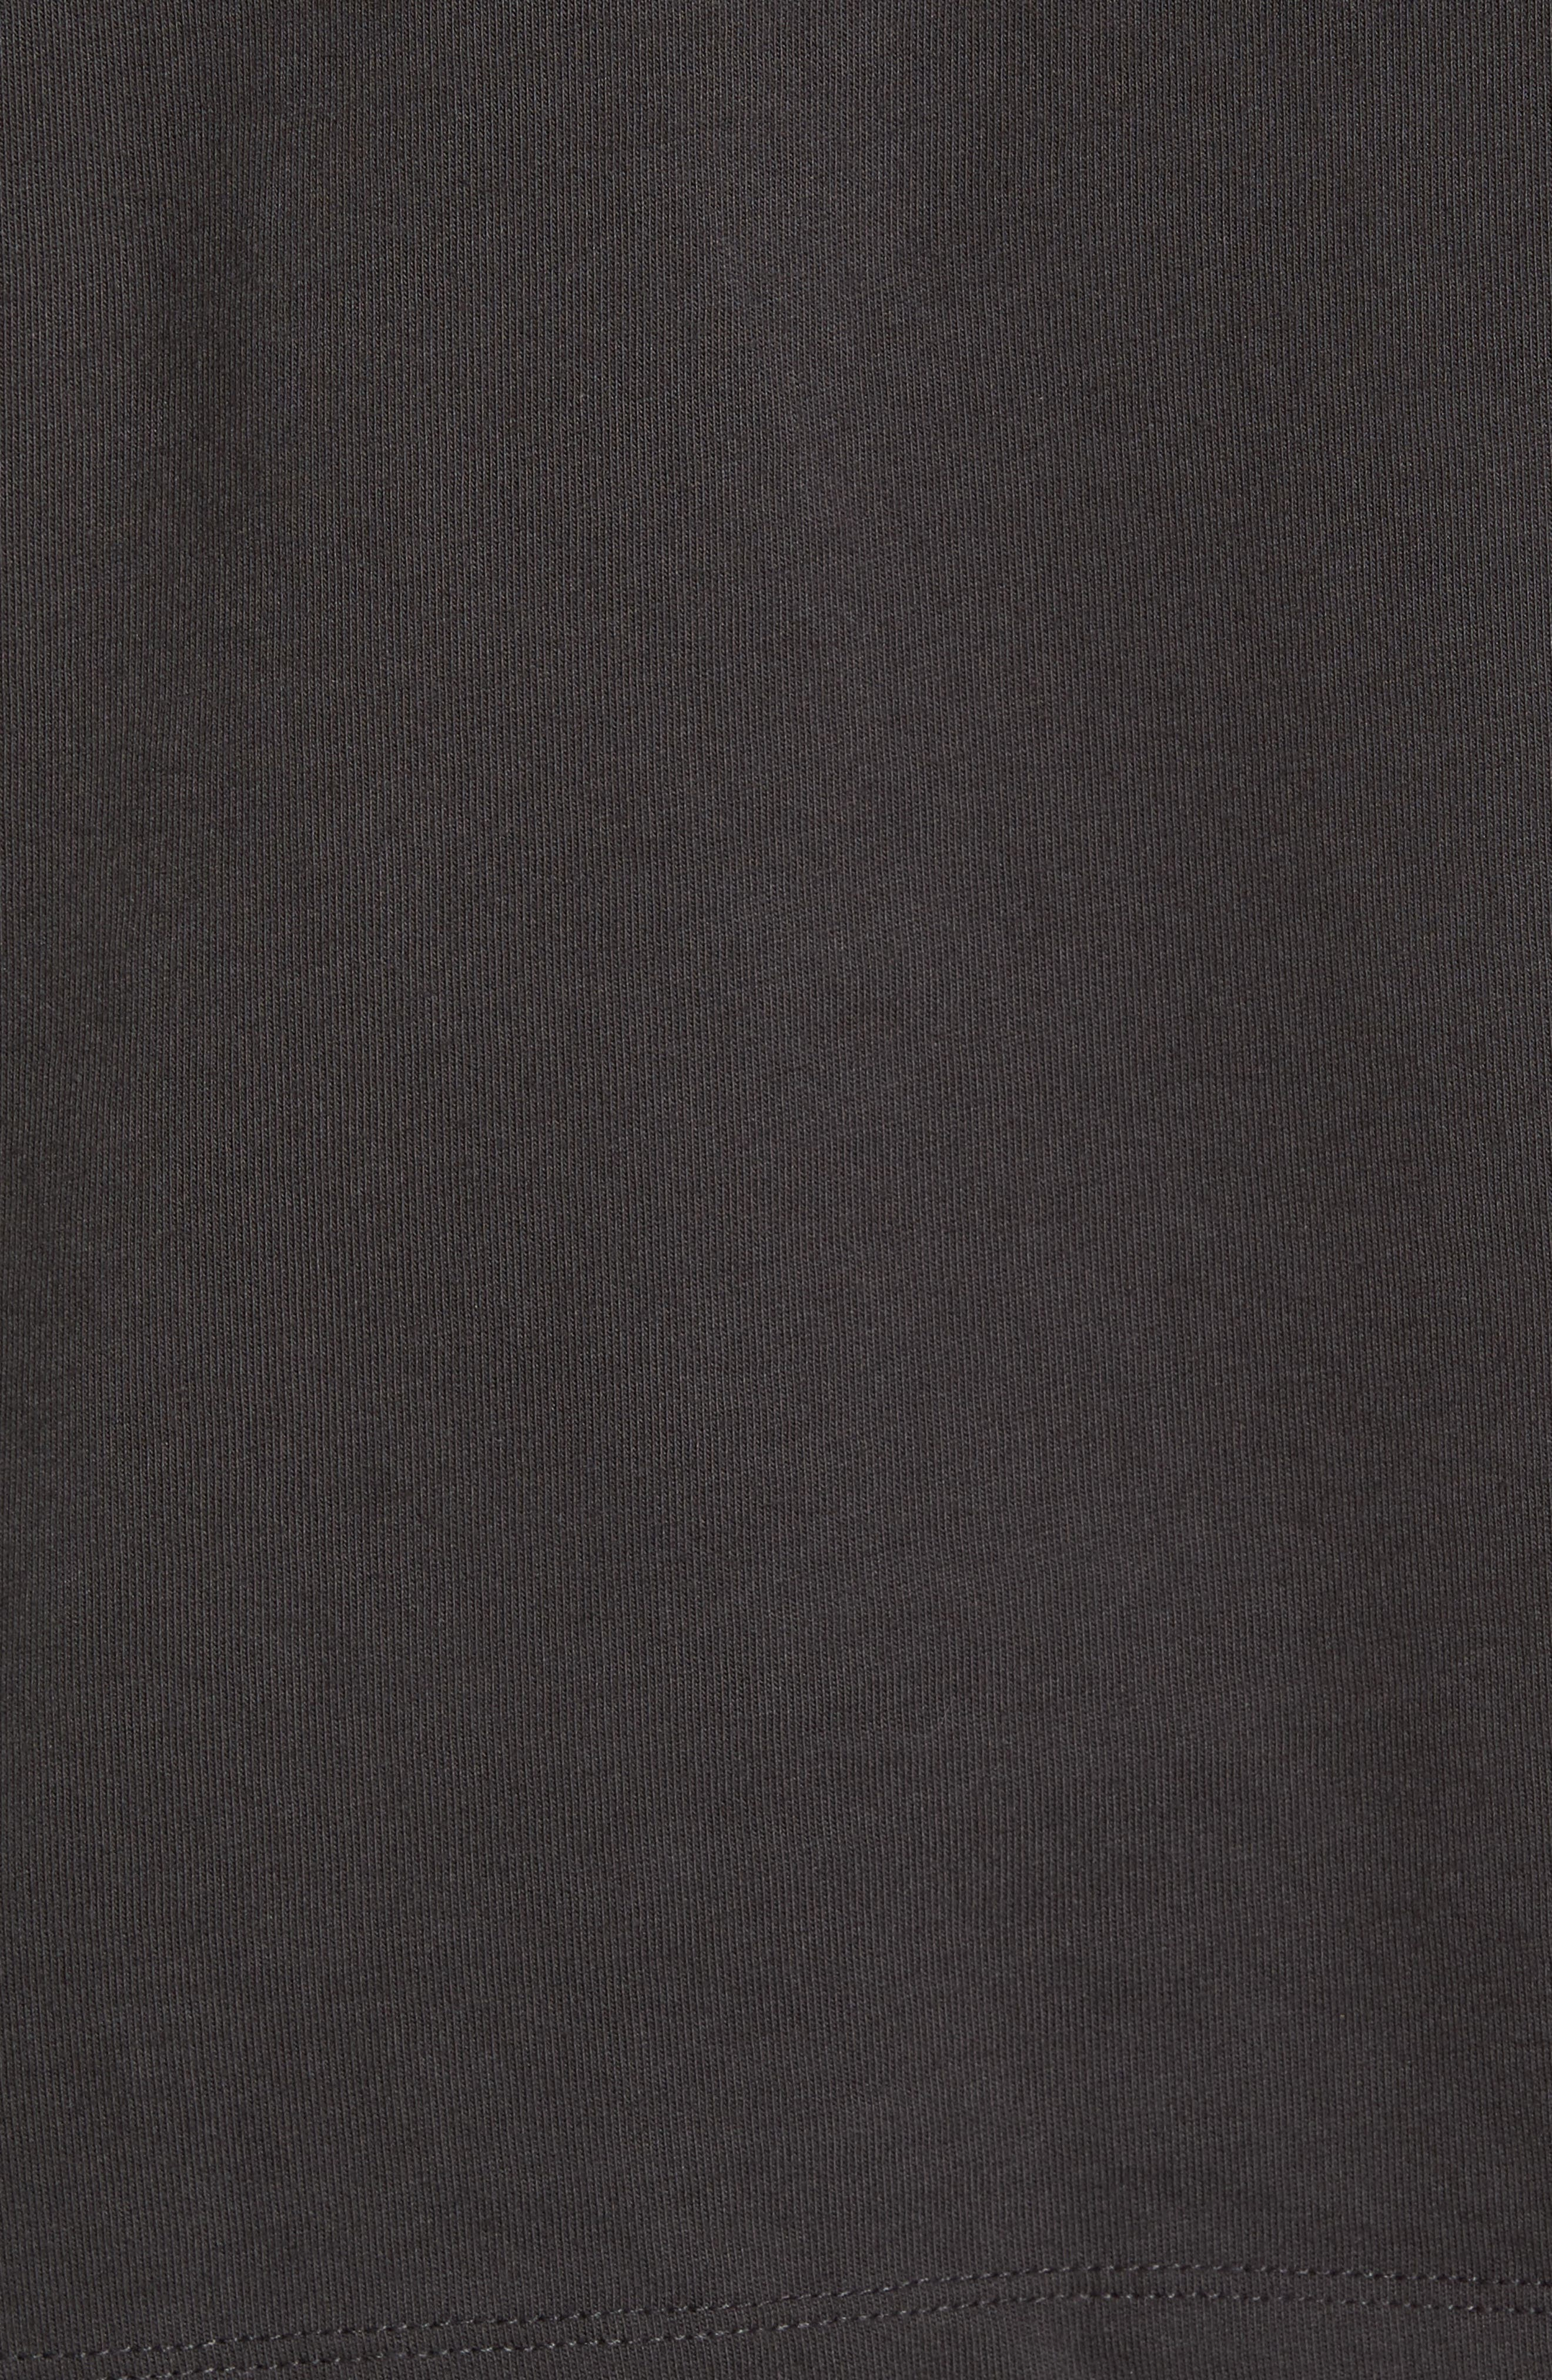 Bands Back T-Shirt,                             Alternate thumbnail 5, color,                             Coal